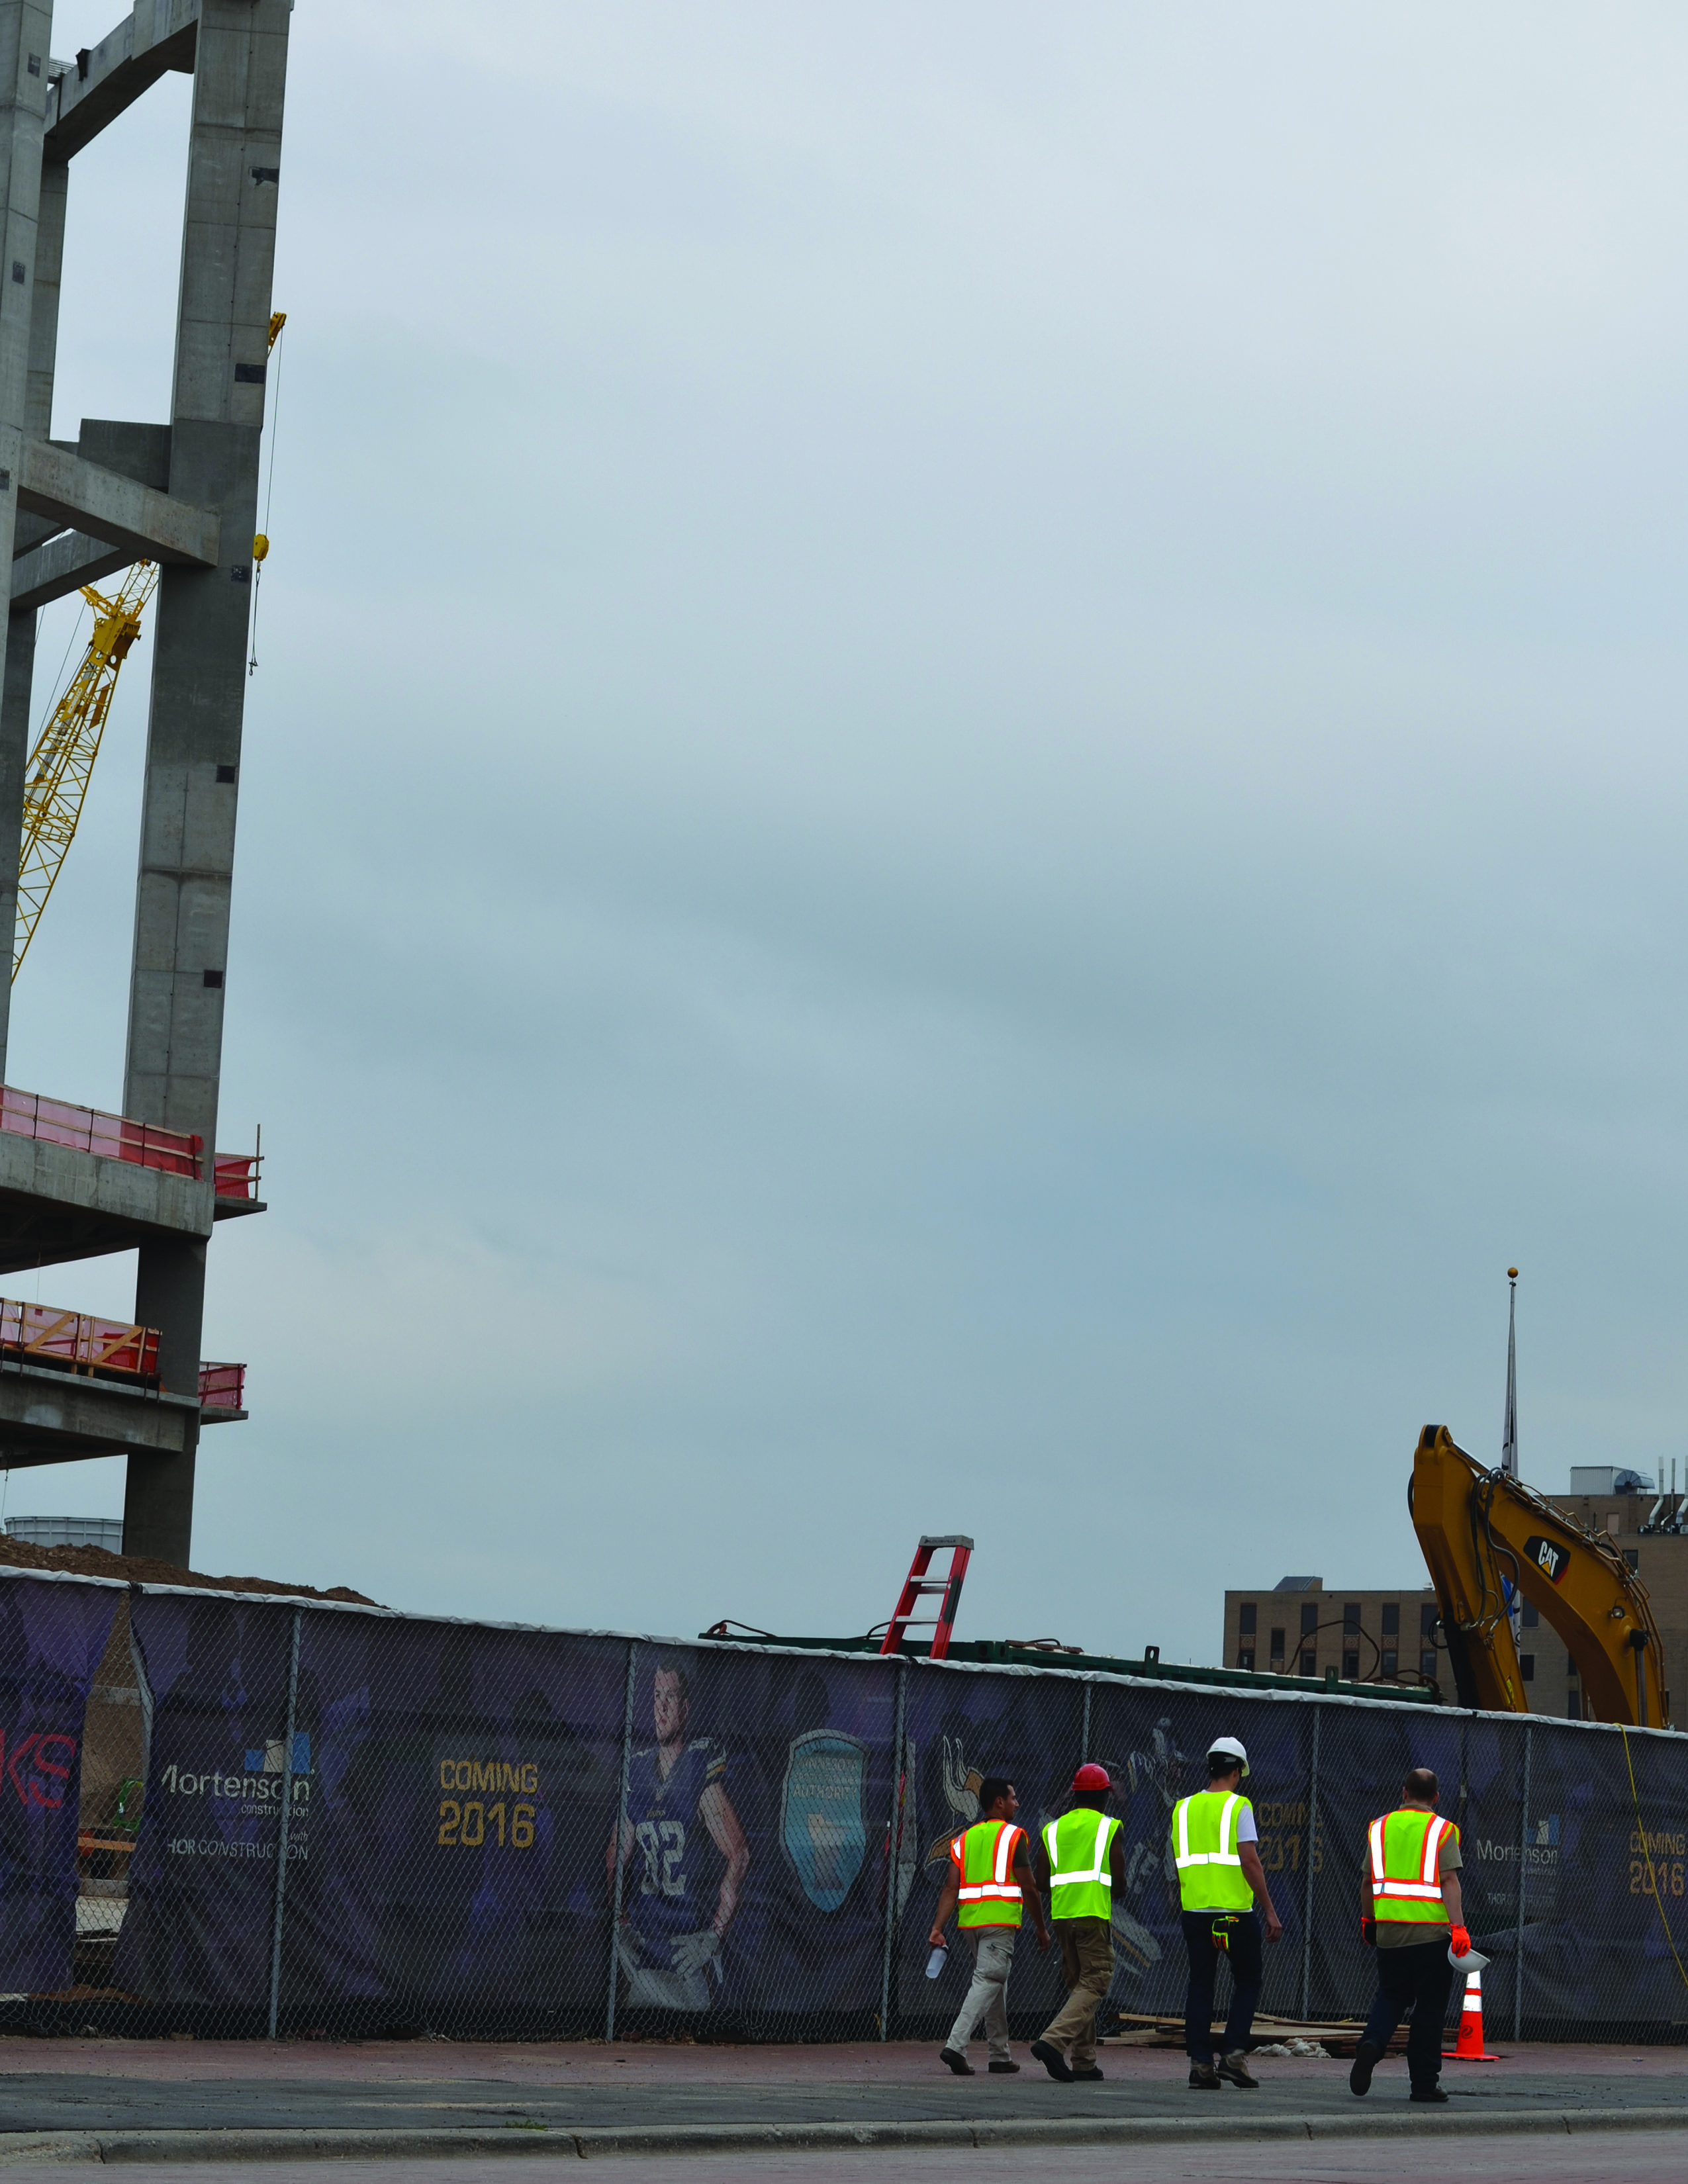 Viking Stadium job site. workers vikings hivis